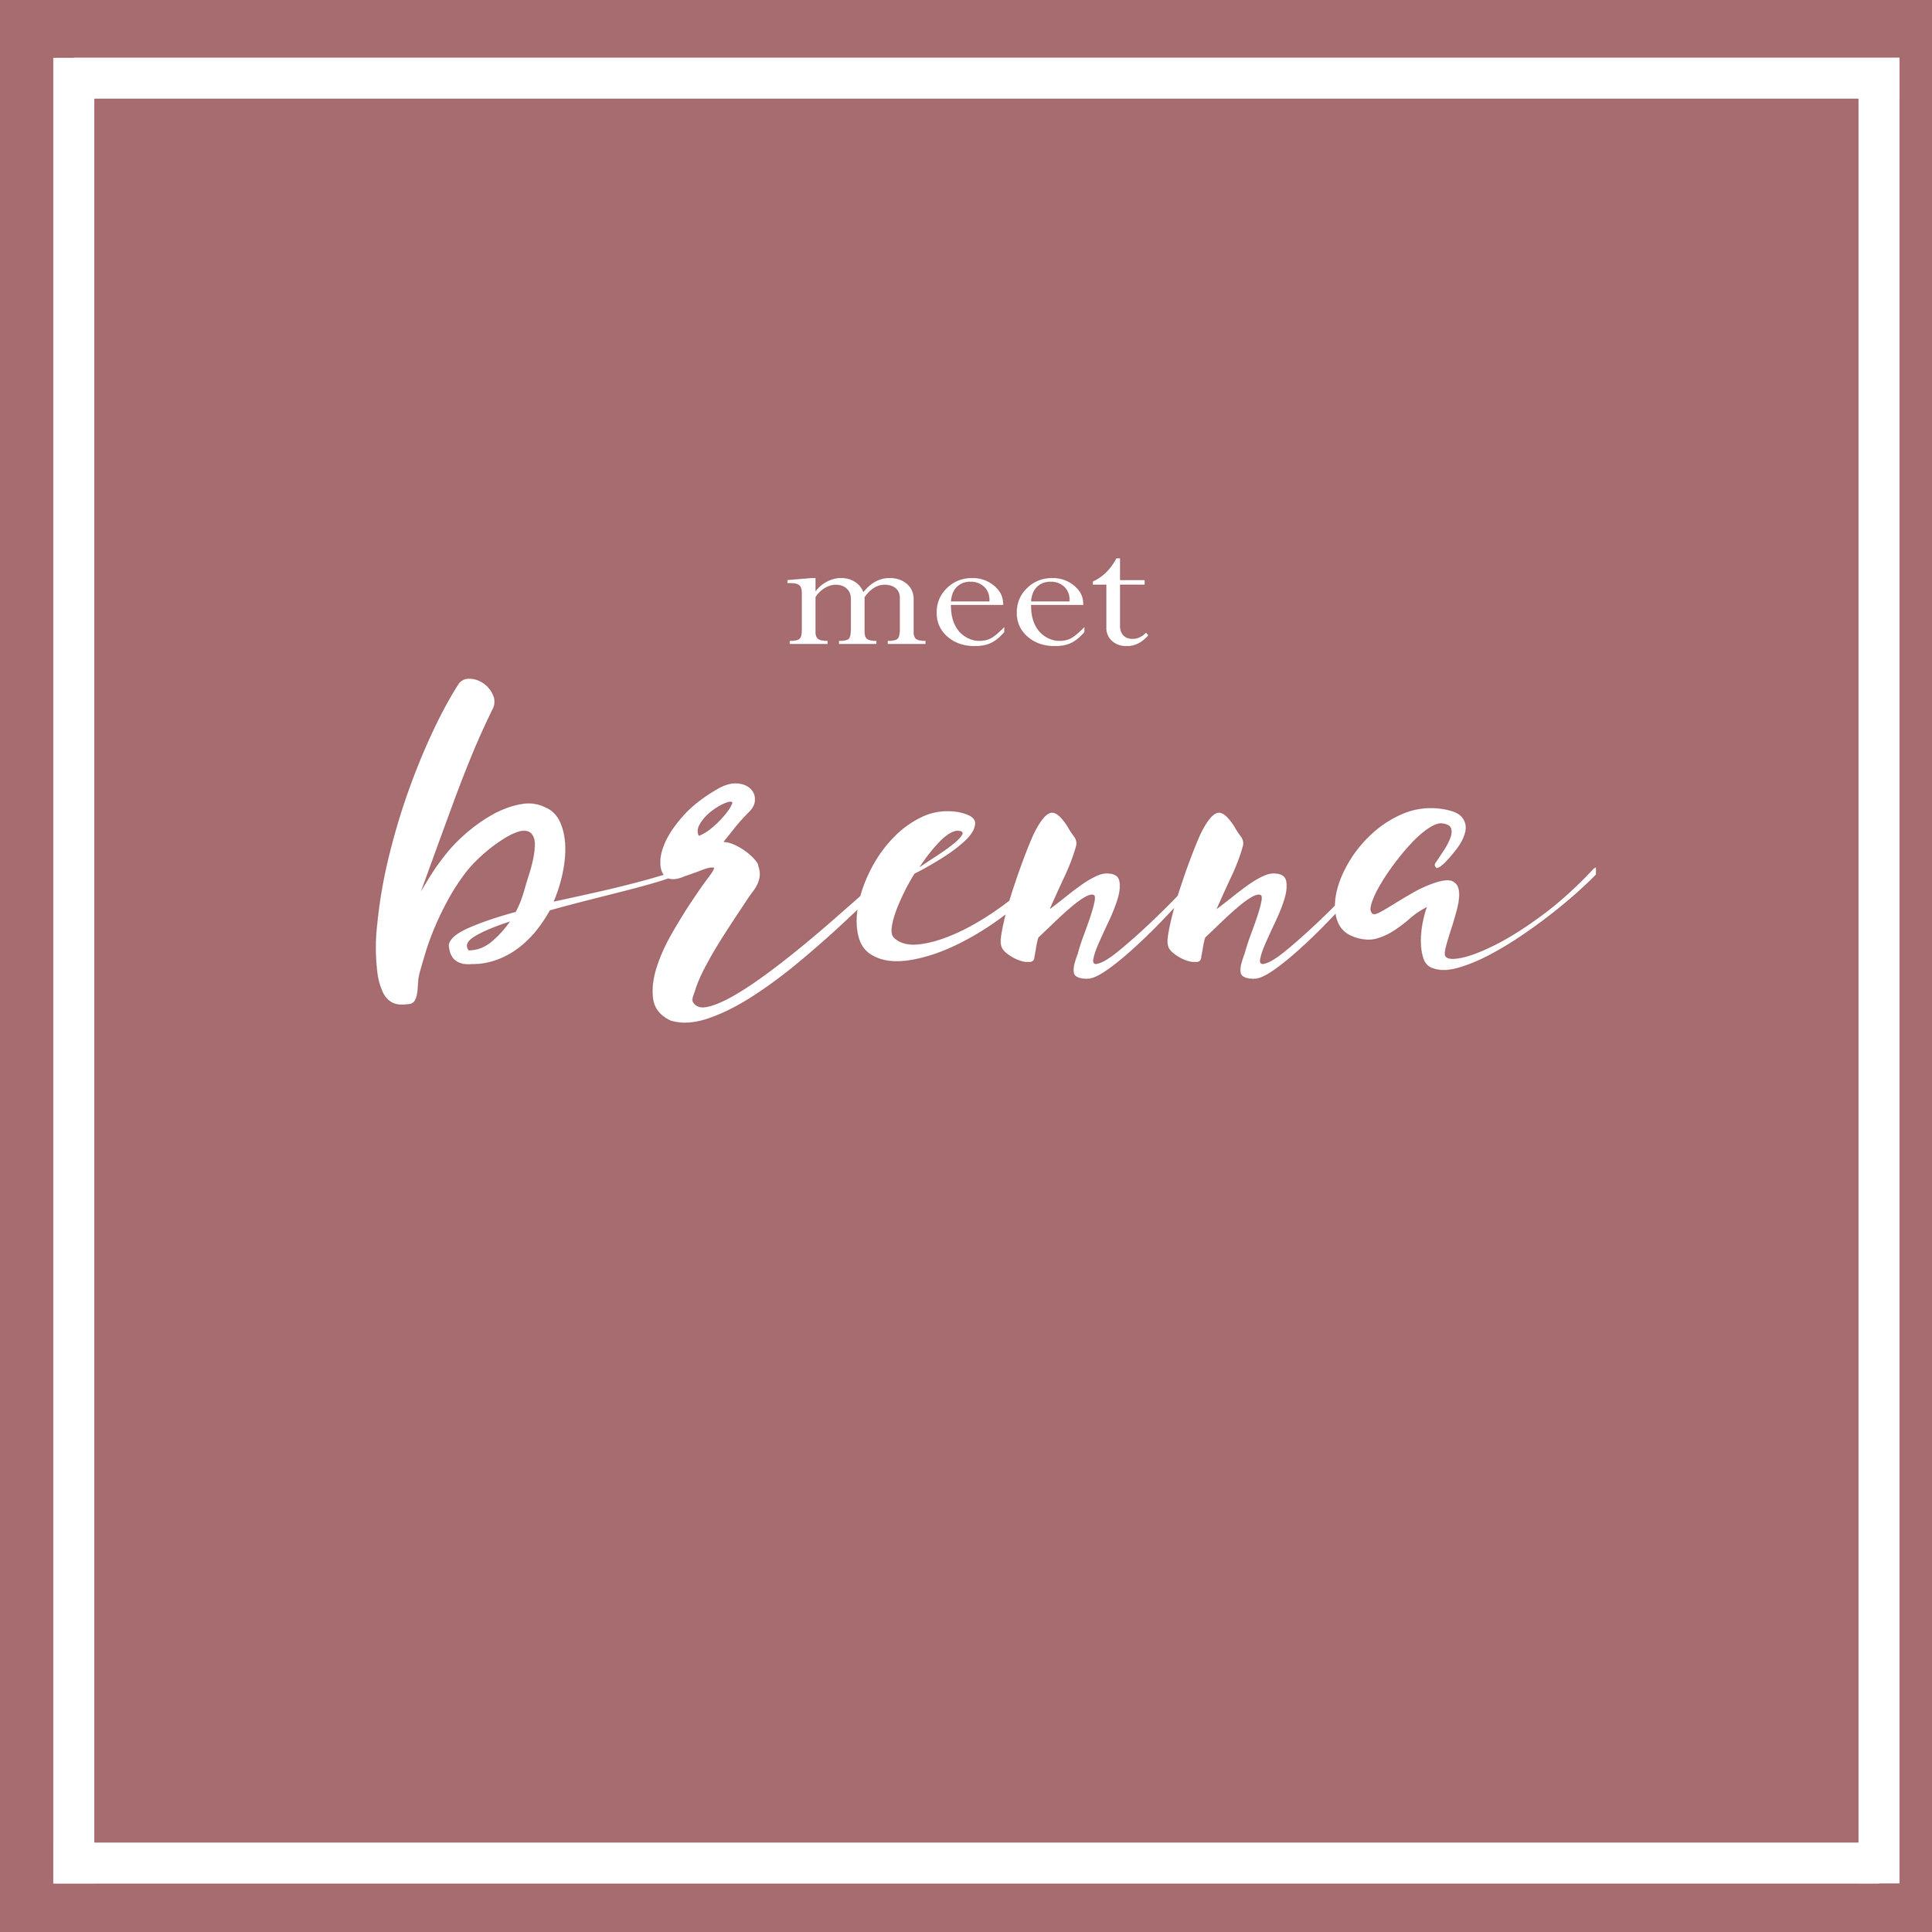 meetbrenna_new2.jpg